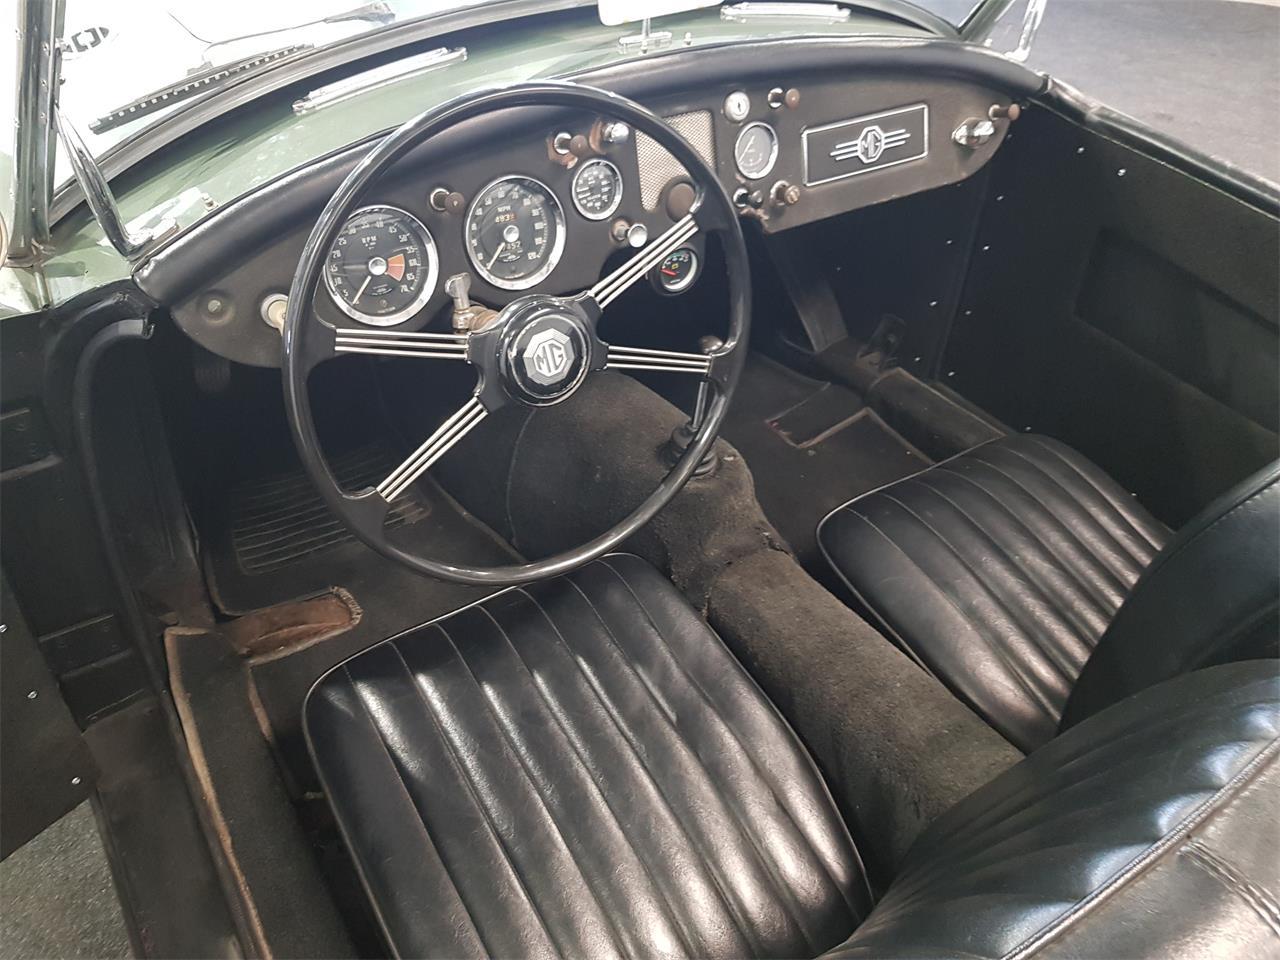 1959 MG MGA (CC-1330930) for sale in Waalwijk, Noord-Brabant